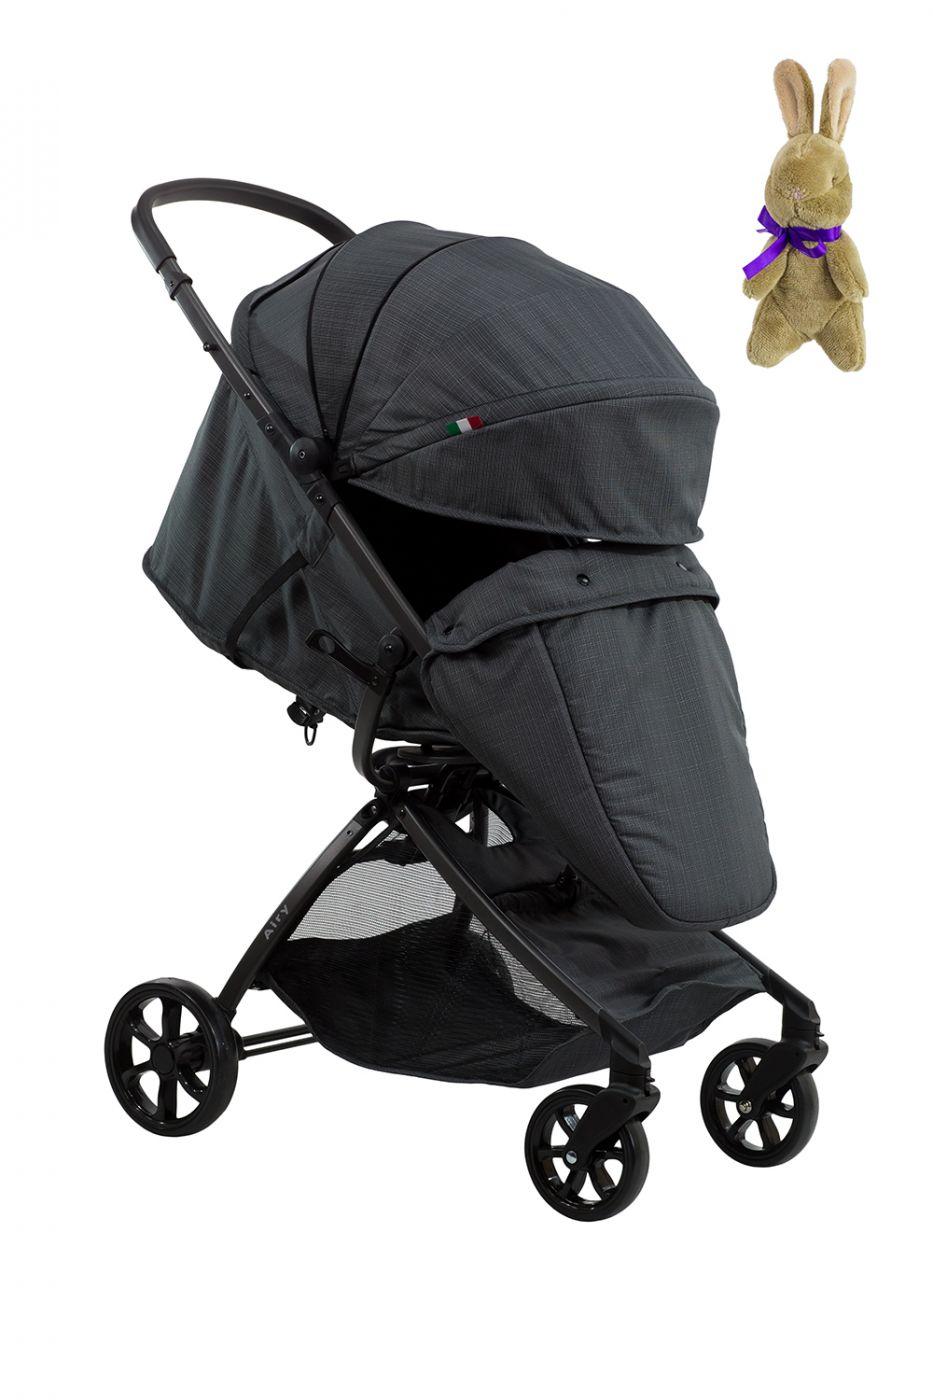 Коляска детская прогулочная Farfello Airy  тёмно-серый / DARK GRAY